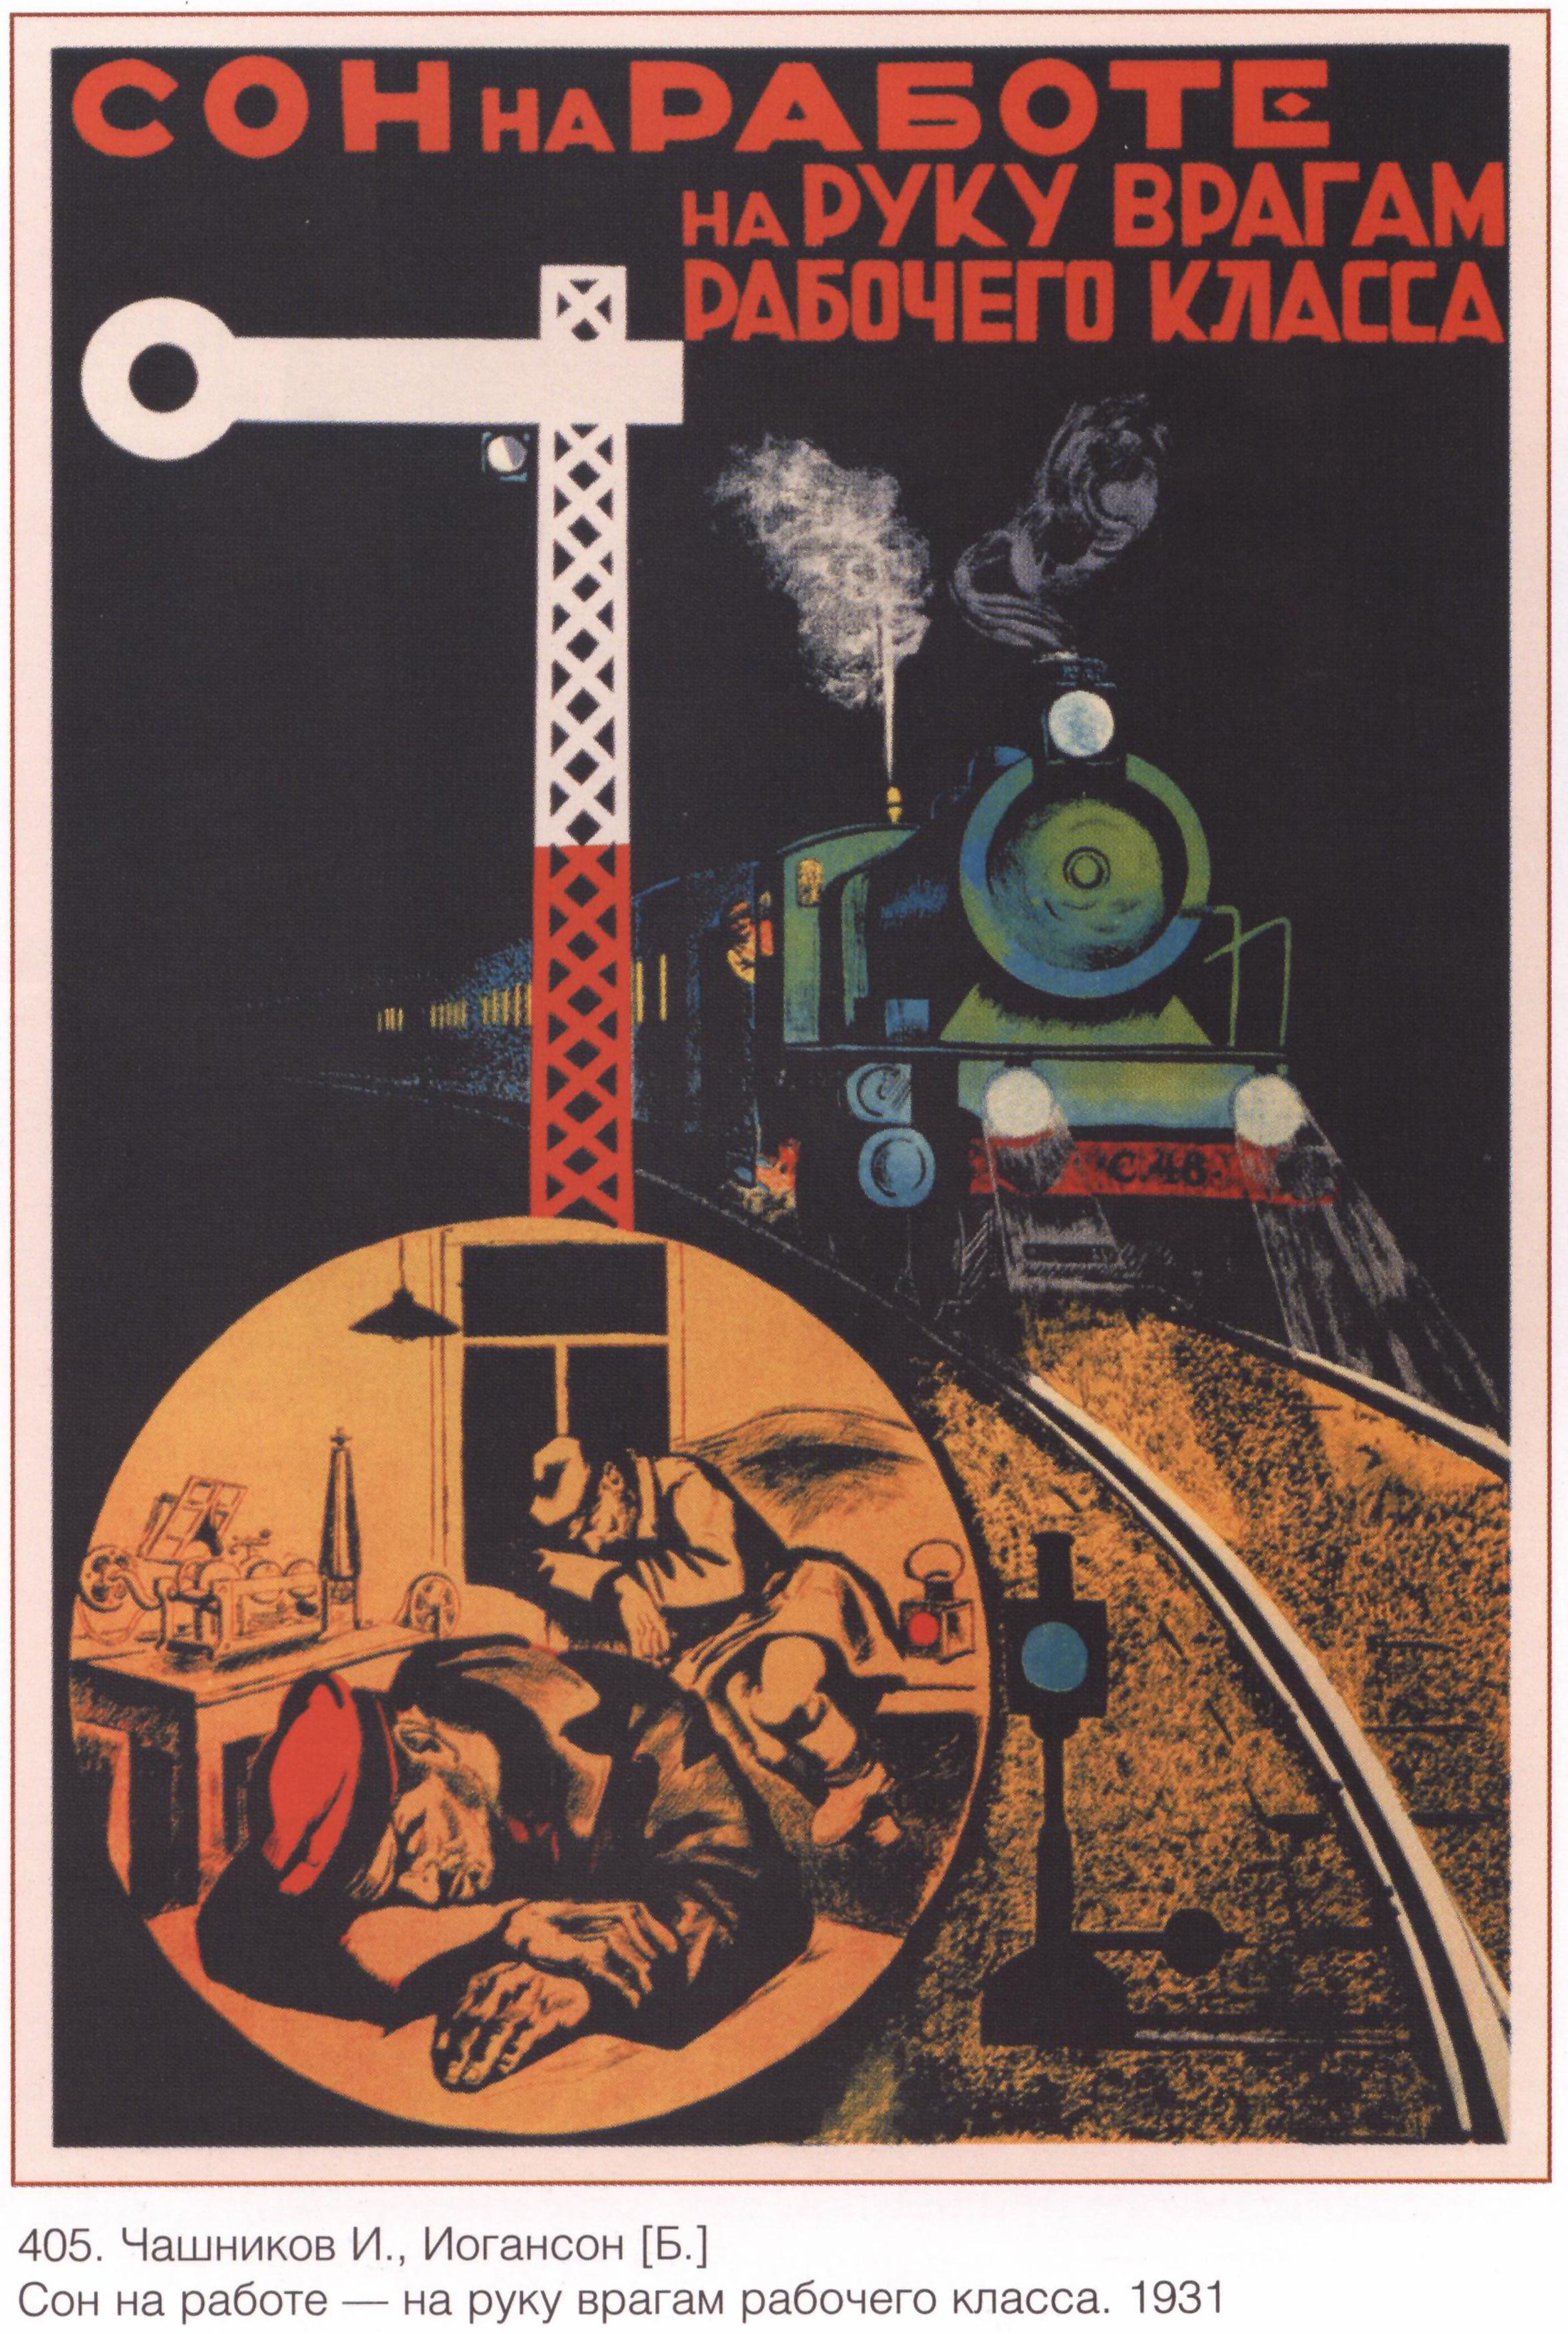 Плакаты - Плакаты СССР: Сон на работе - на руку врагам рабочего класса.